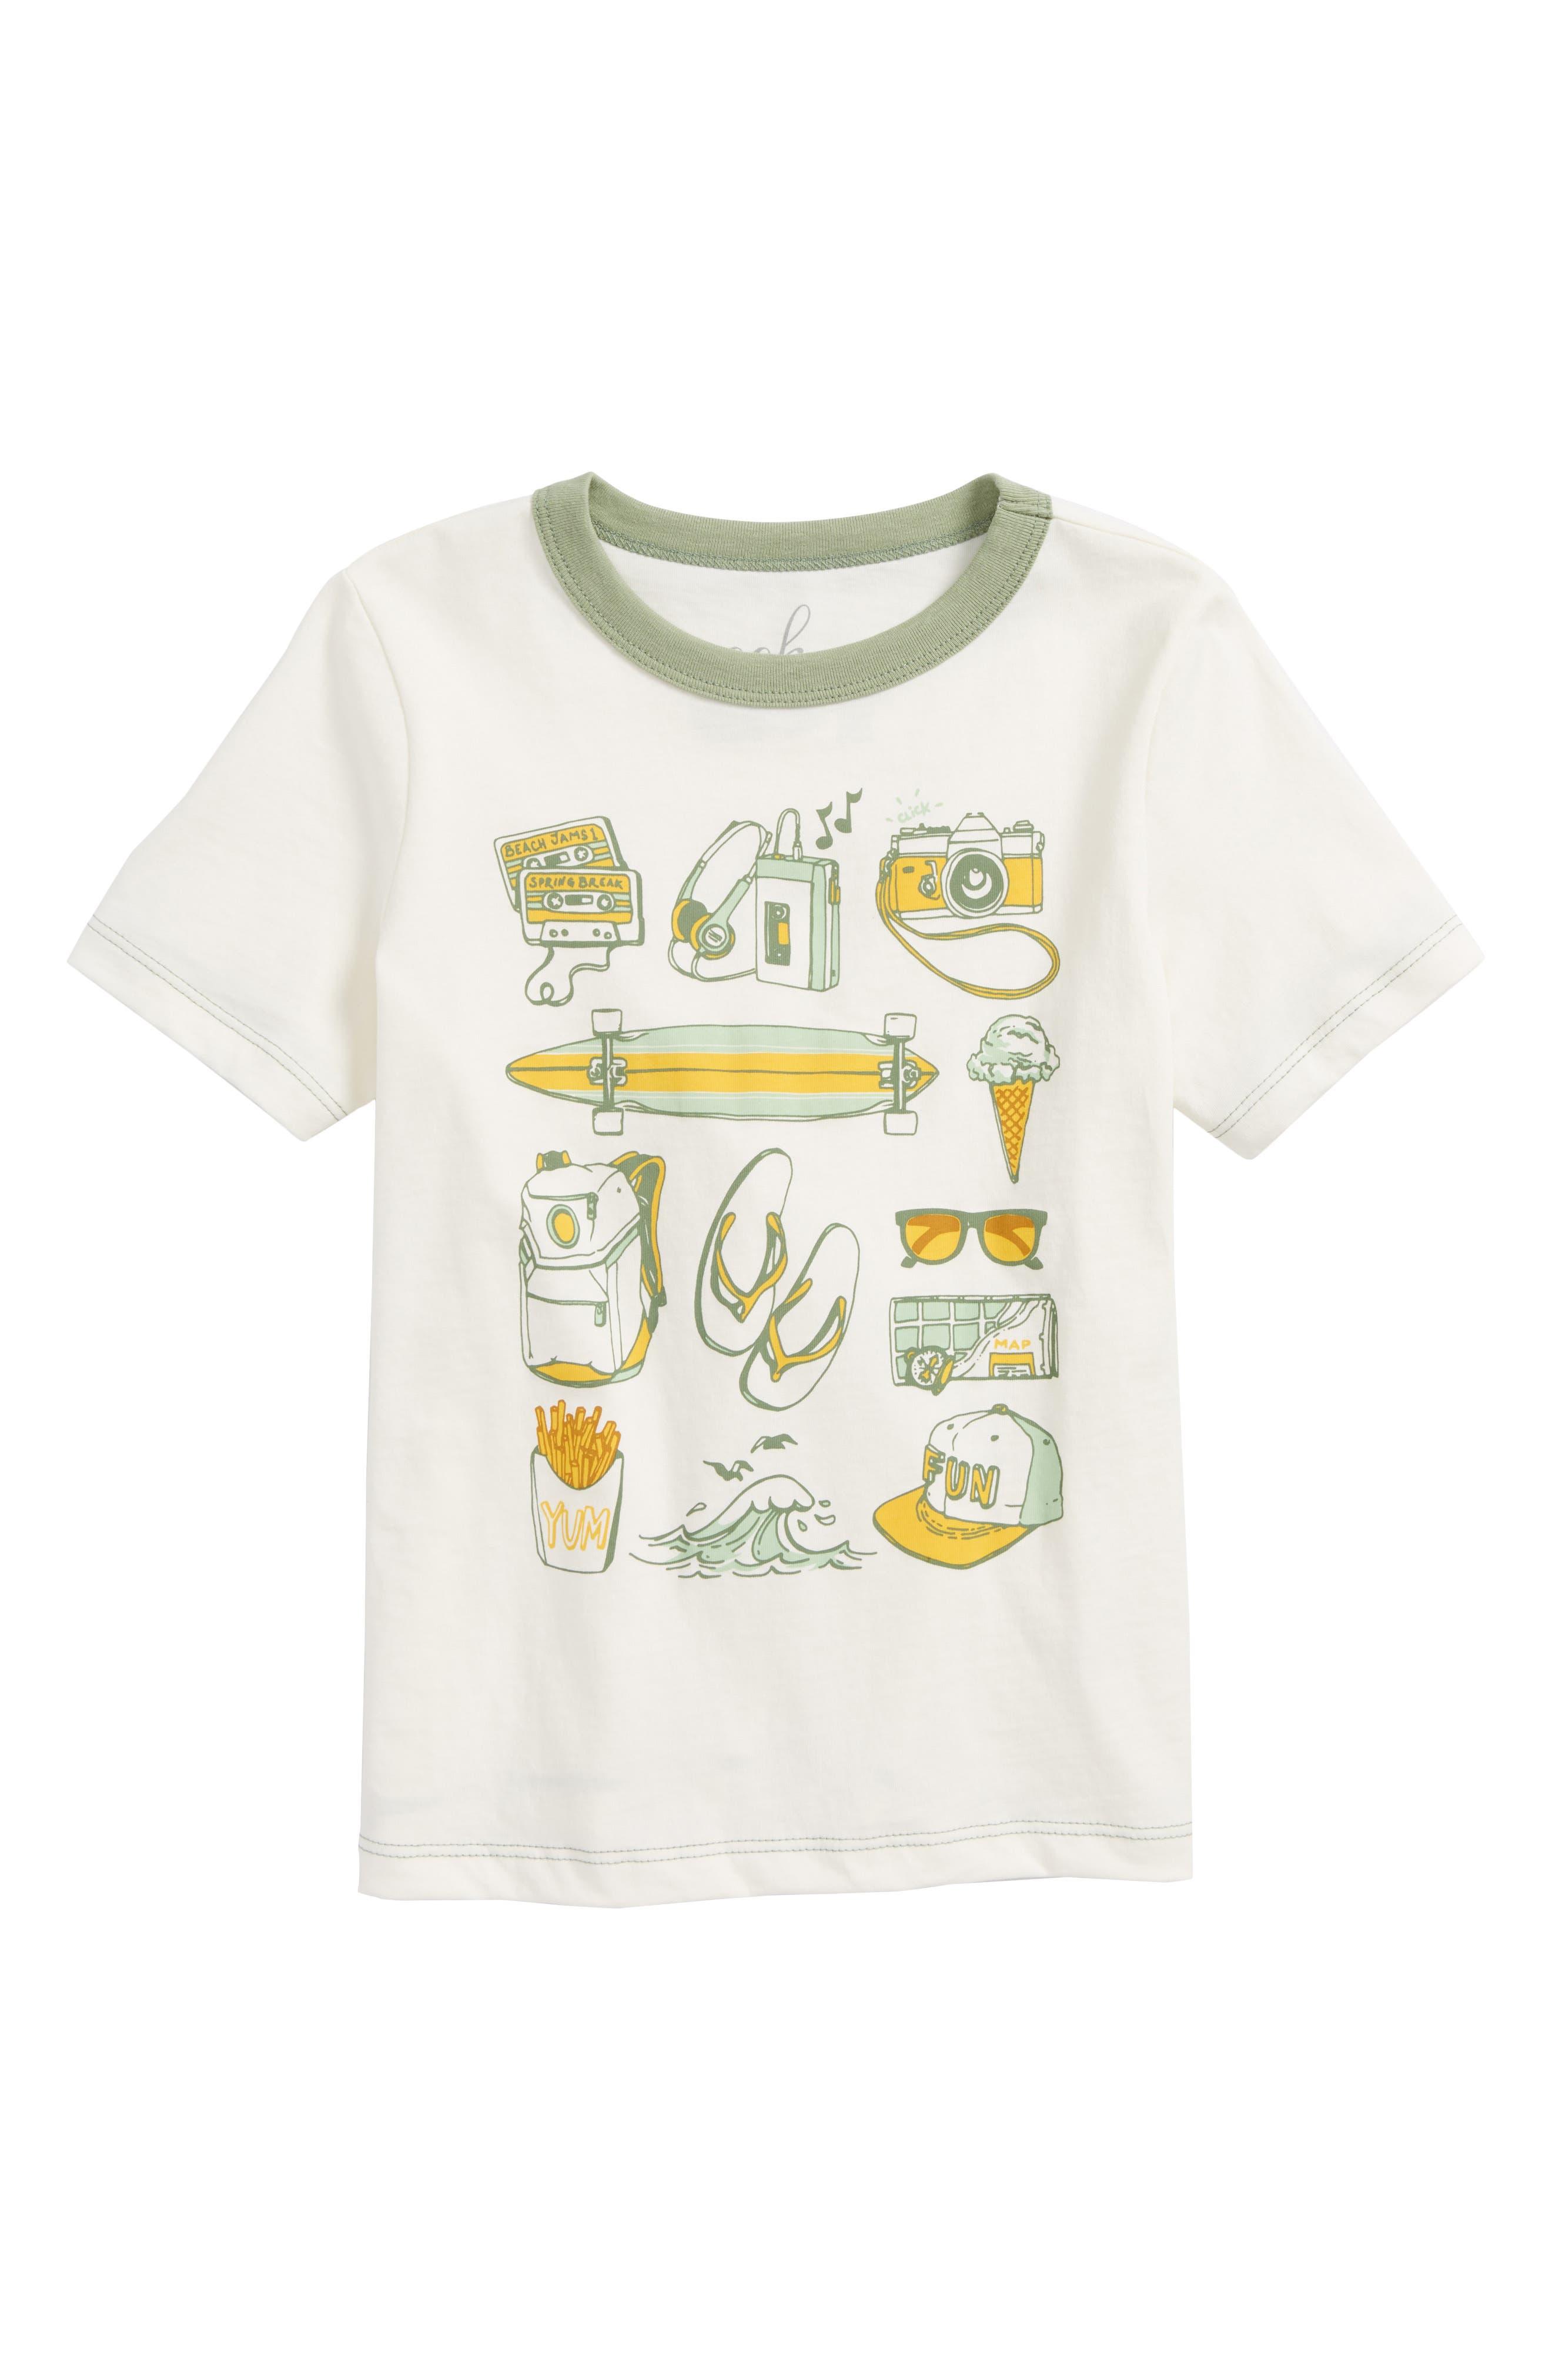 Spring Break Checklist T-Shirt,                         Main,                         color, Ivory